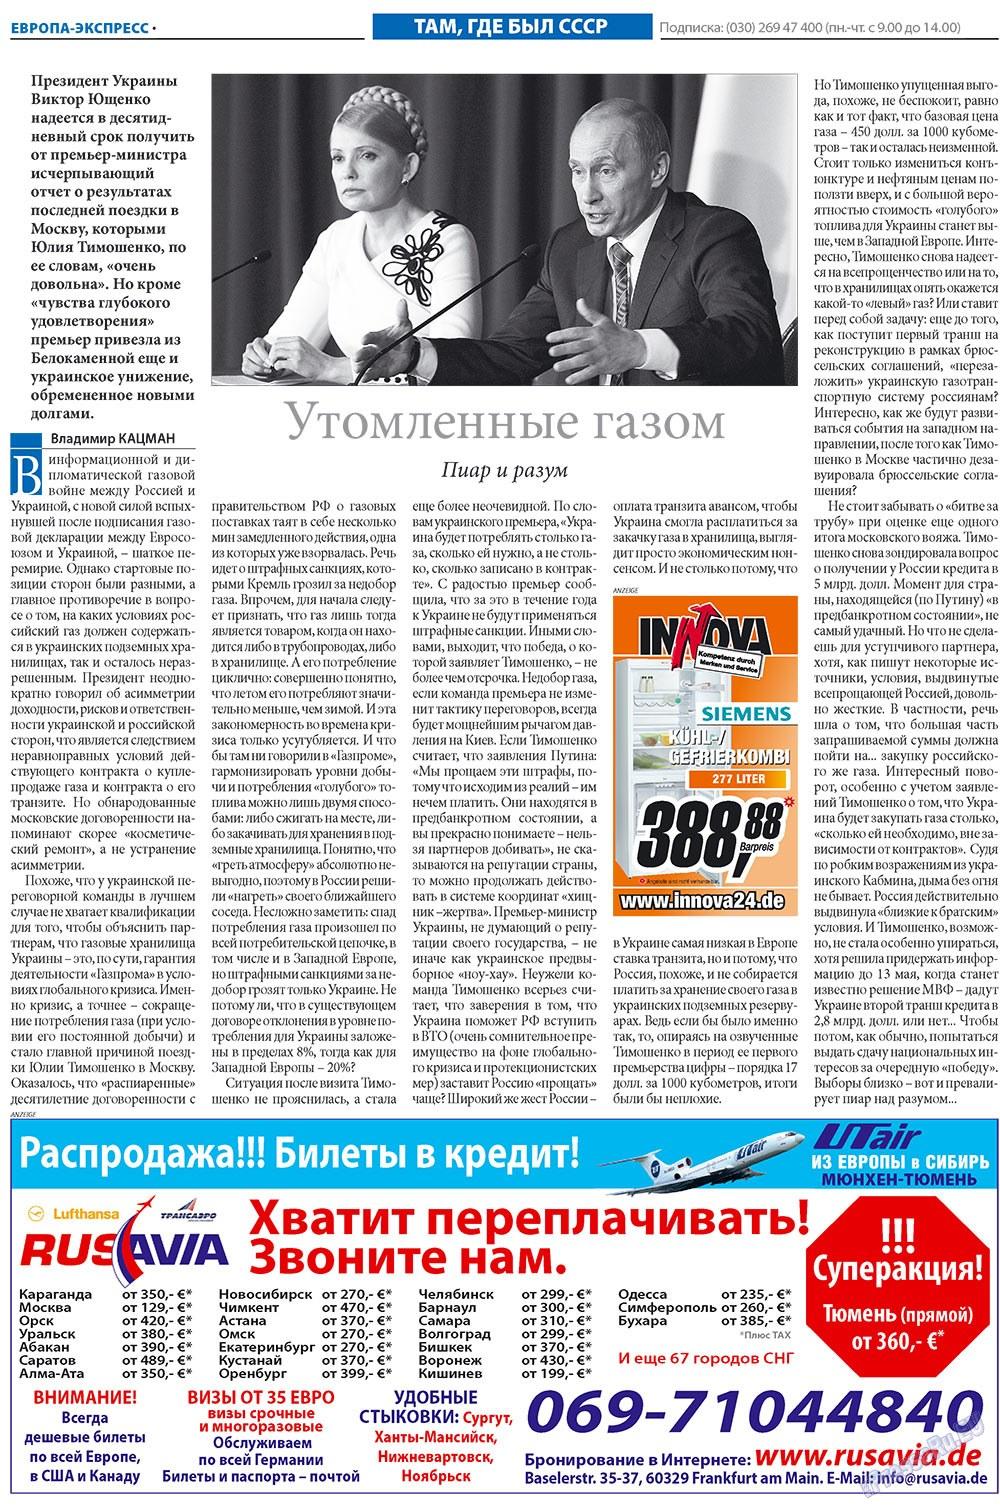 Европа экспресс (газета). 2009 год, номер 19, стр. 13